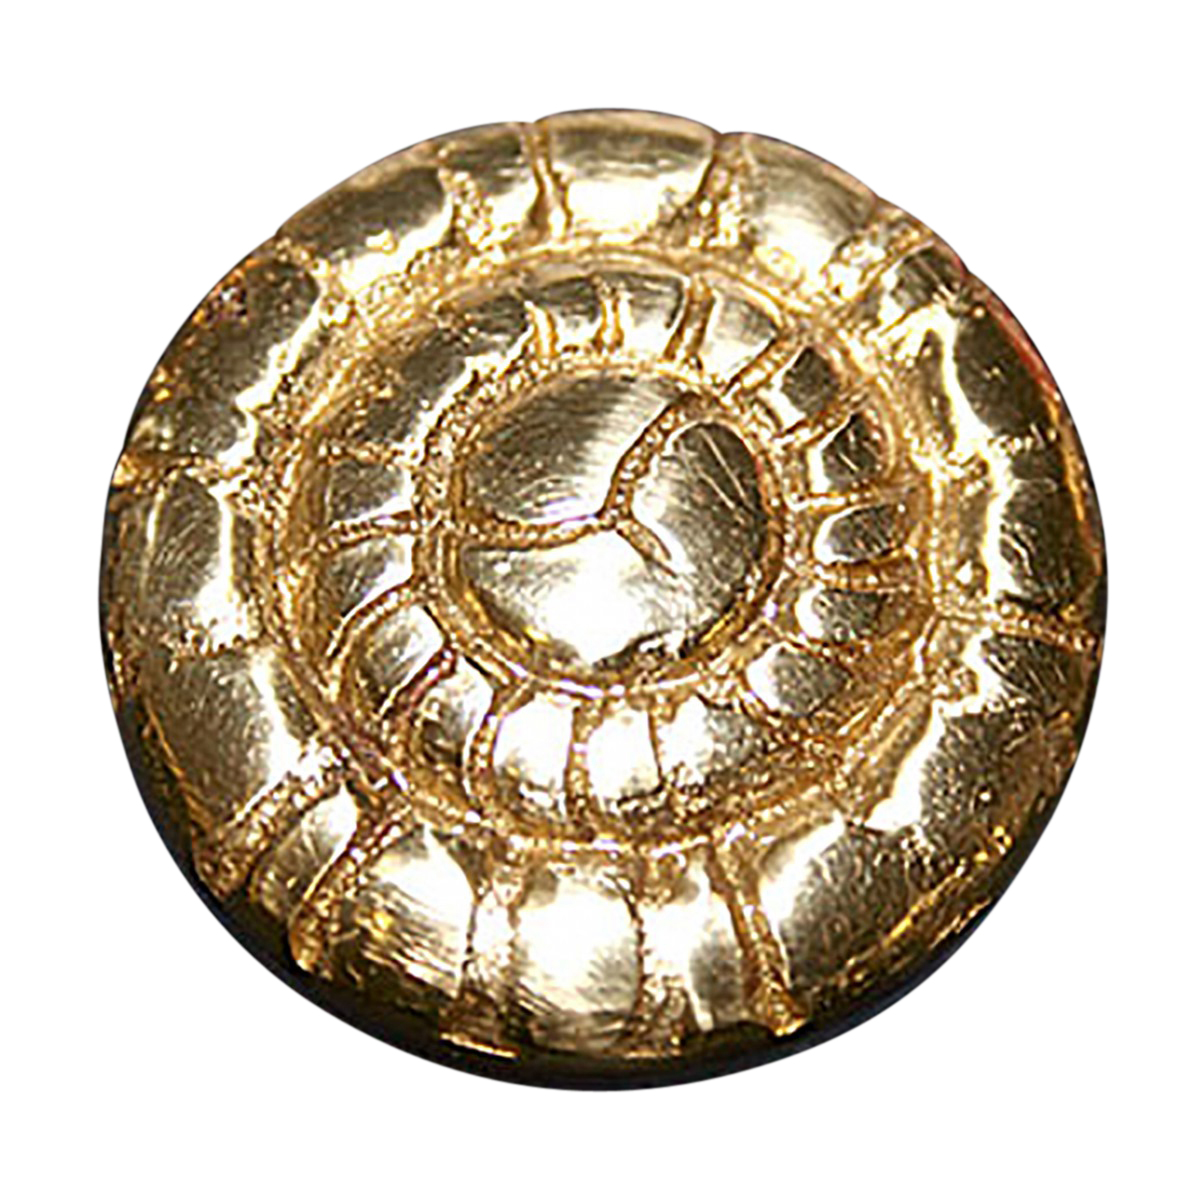 "2"" Tubing End Plug Decorative Cap Polished Solid Brass | Renovator's Supply"